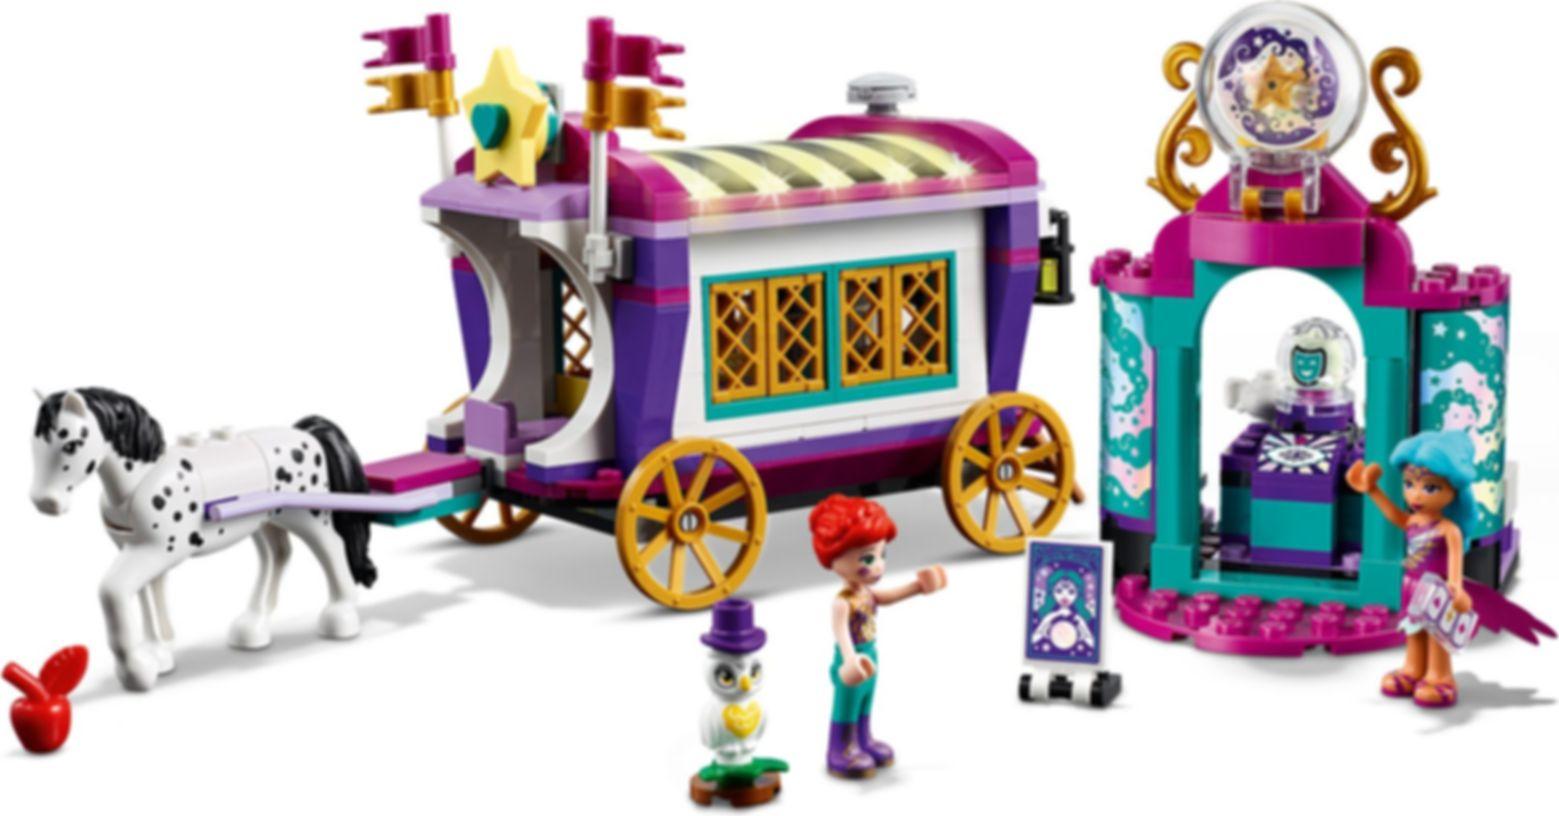 LEGO® Friends Magical Caravan gameplay